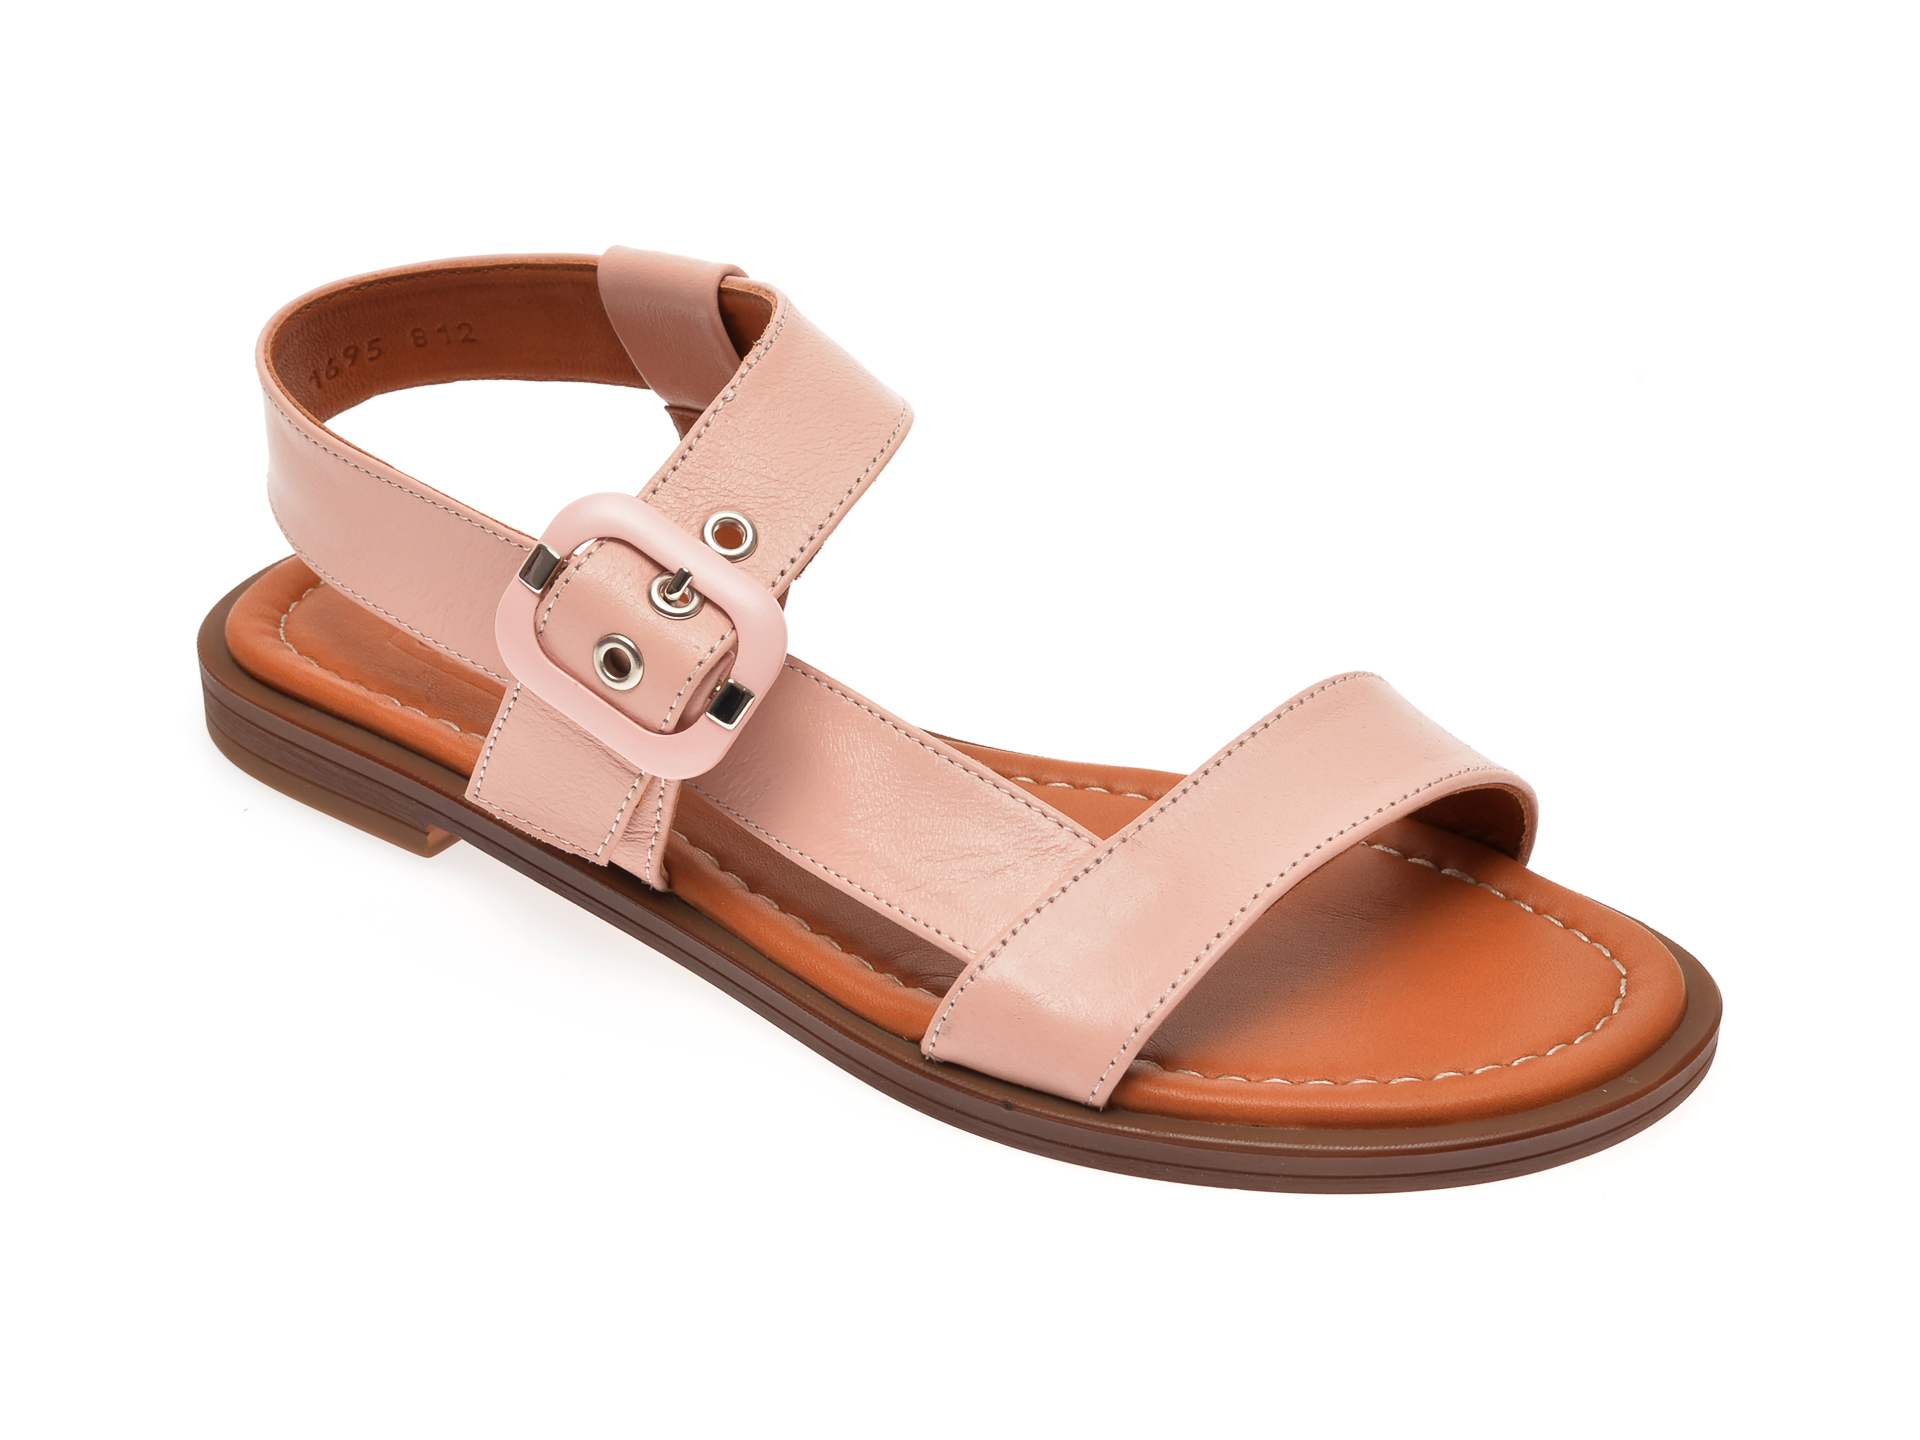 Sandale FLAVIA PASSINI nude, 0021695, din piele naturala